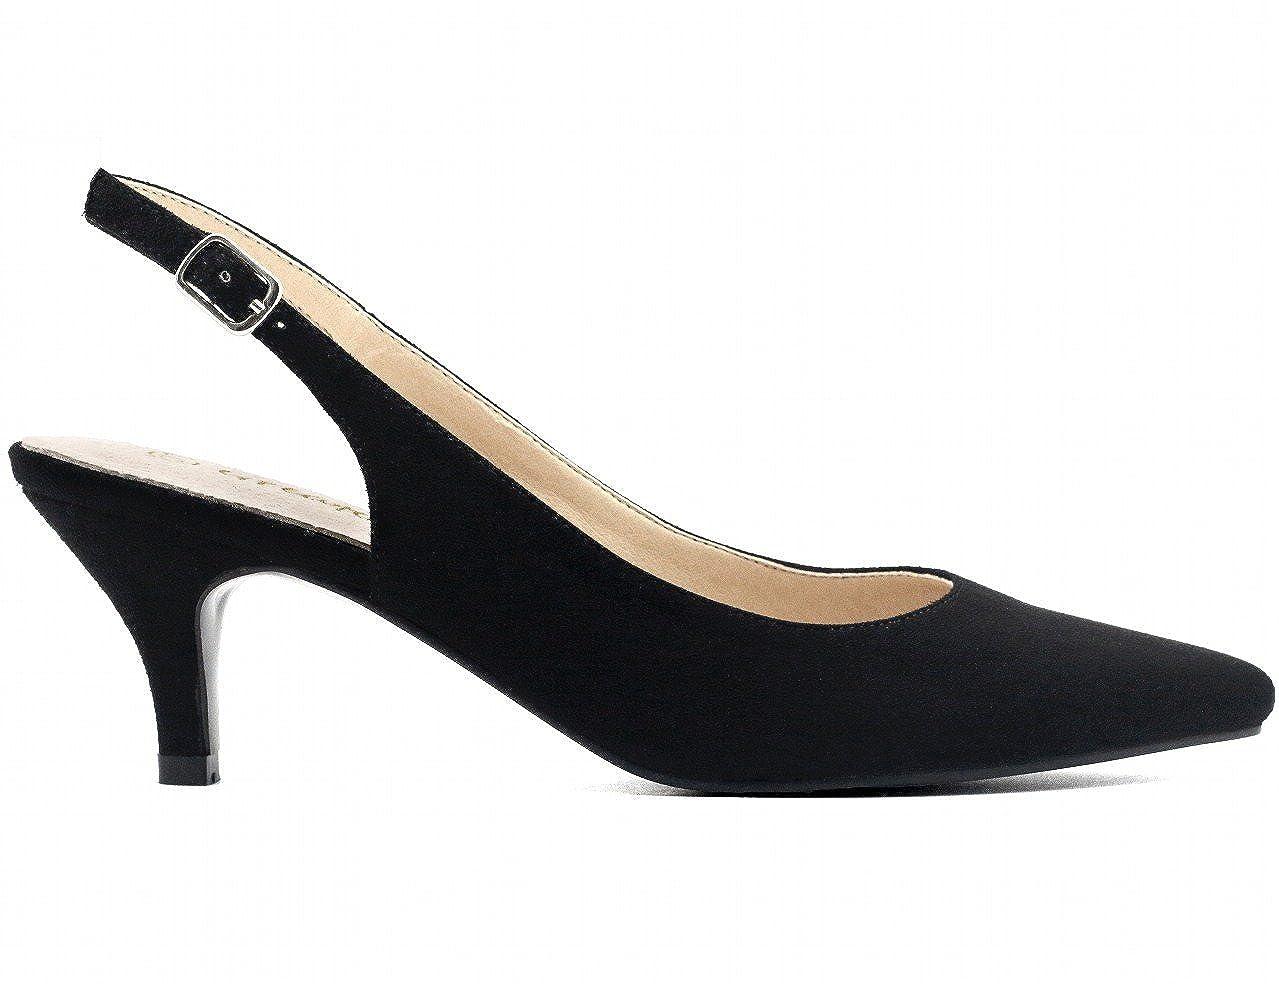 a58572fa4d35d3 Greatonu Womens Pointed Toe Slingback Dress Court Shoes: Amazon.co.uk: Shoes  & Bags